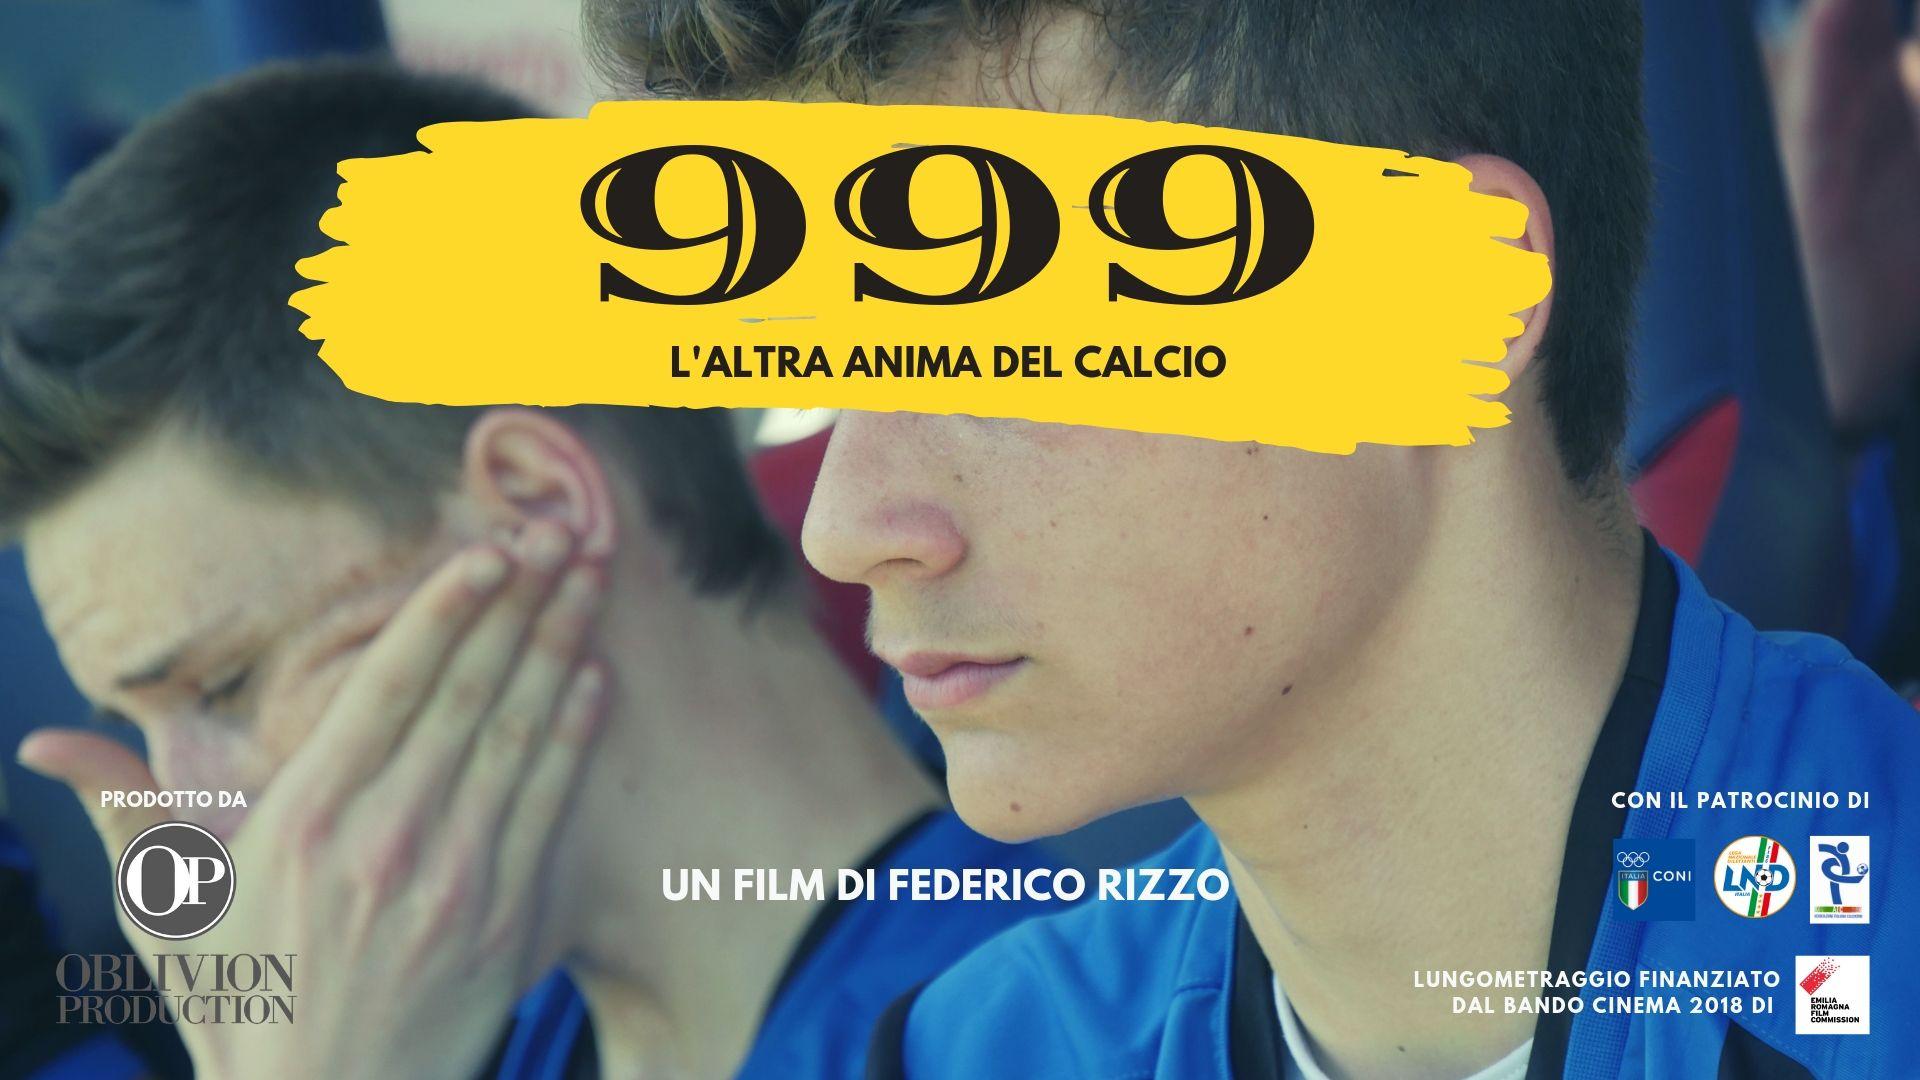 Casting aperti per attori e attrici residenti in Emilia Romagna